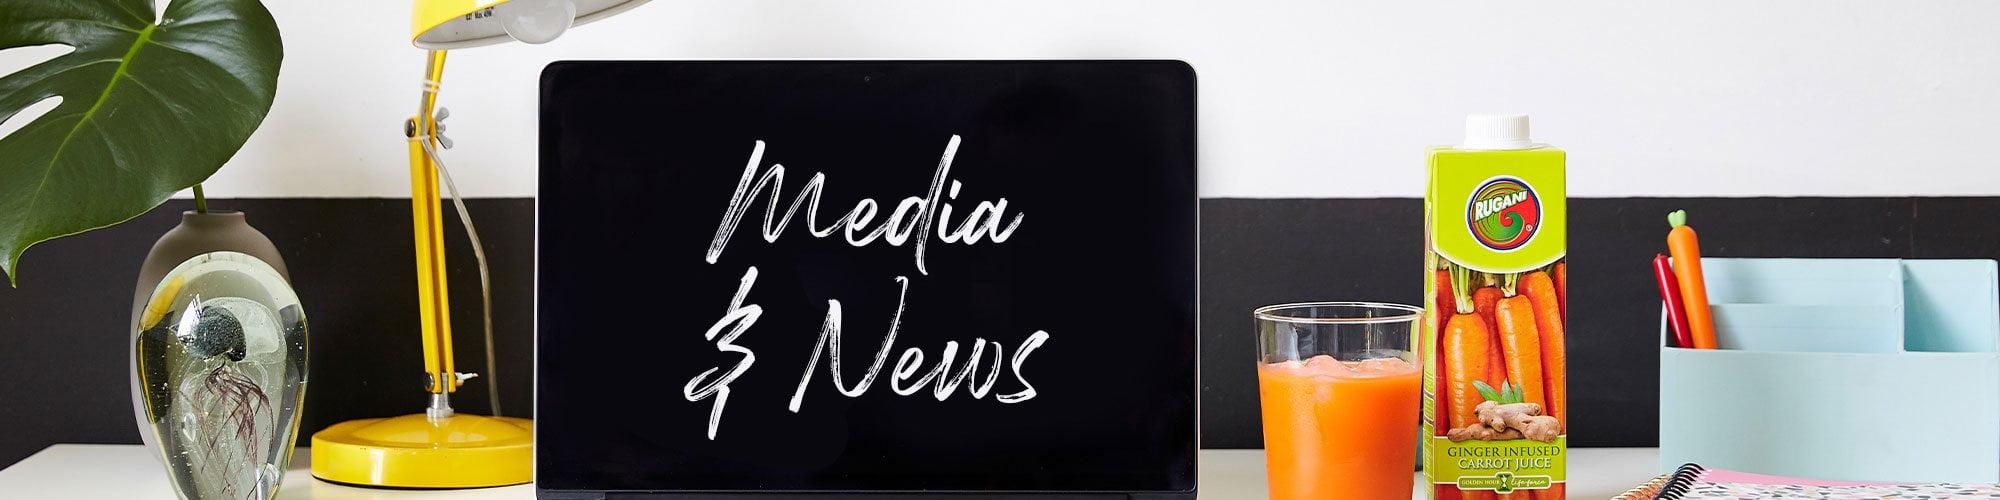 media-news-page-2000-x-500